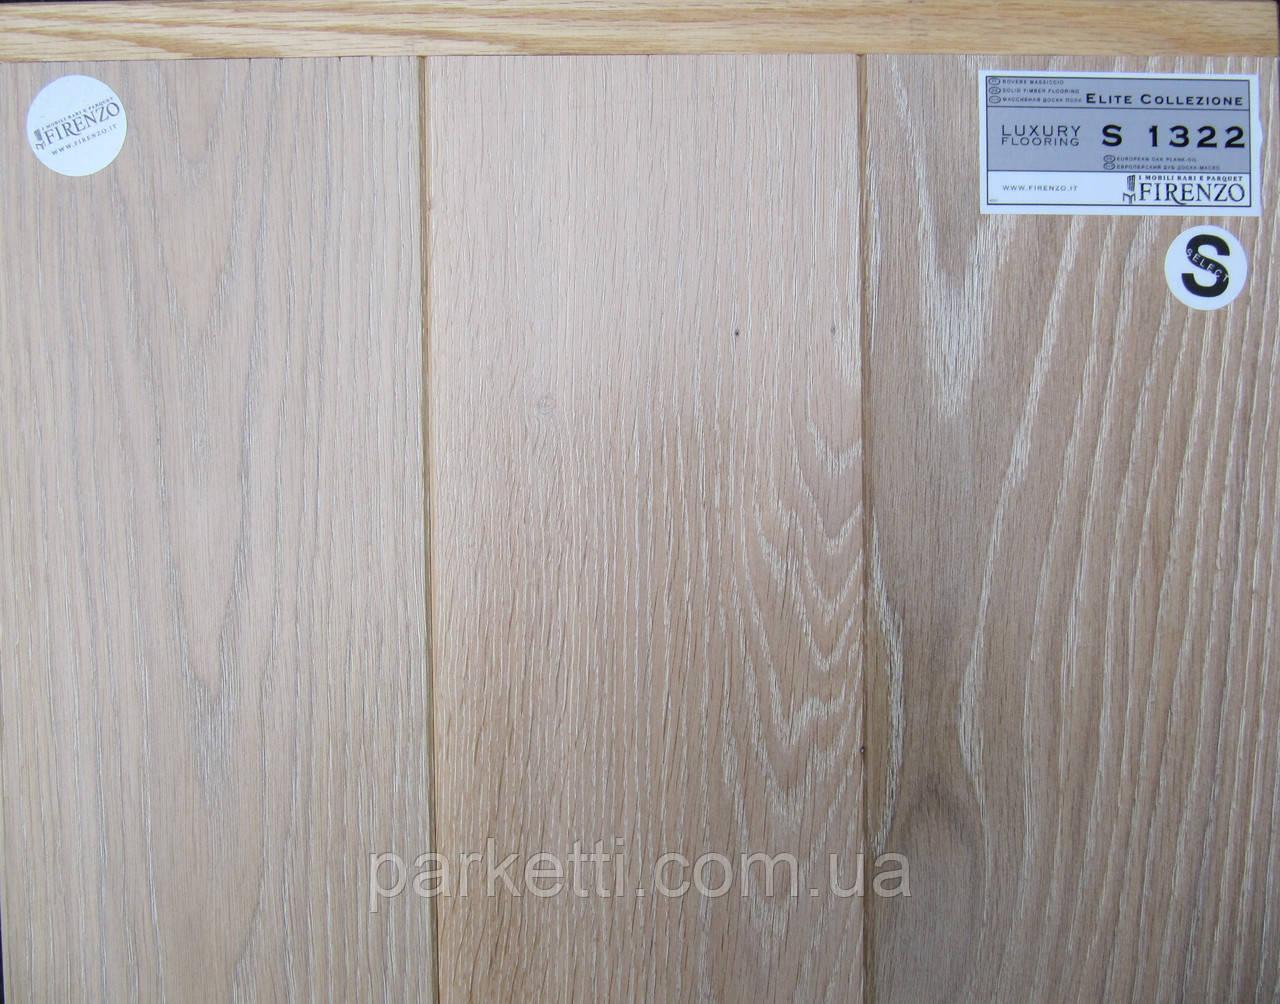 Firenzo S1322 European oak plank-oil массивная доска, фото 1